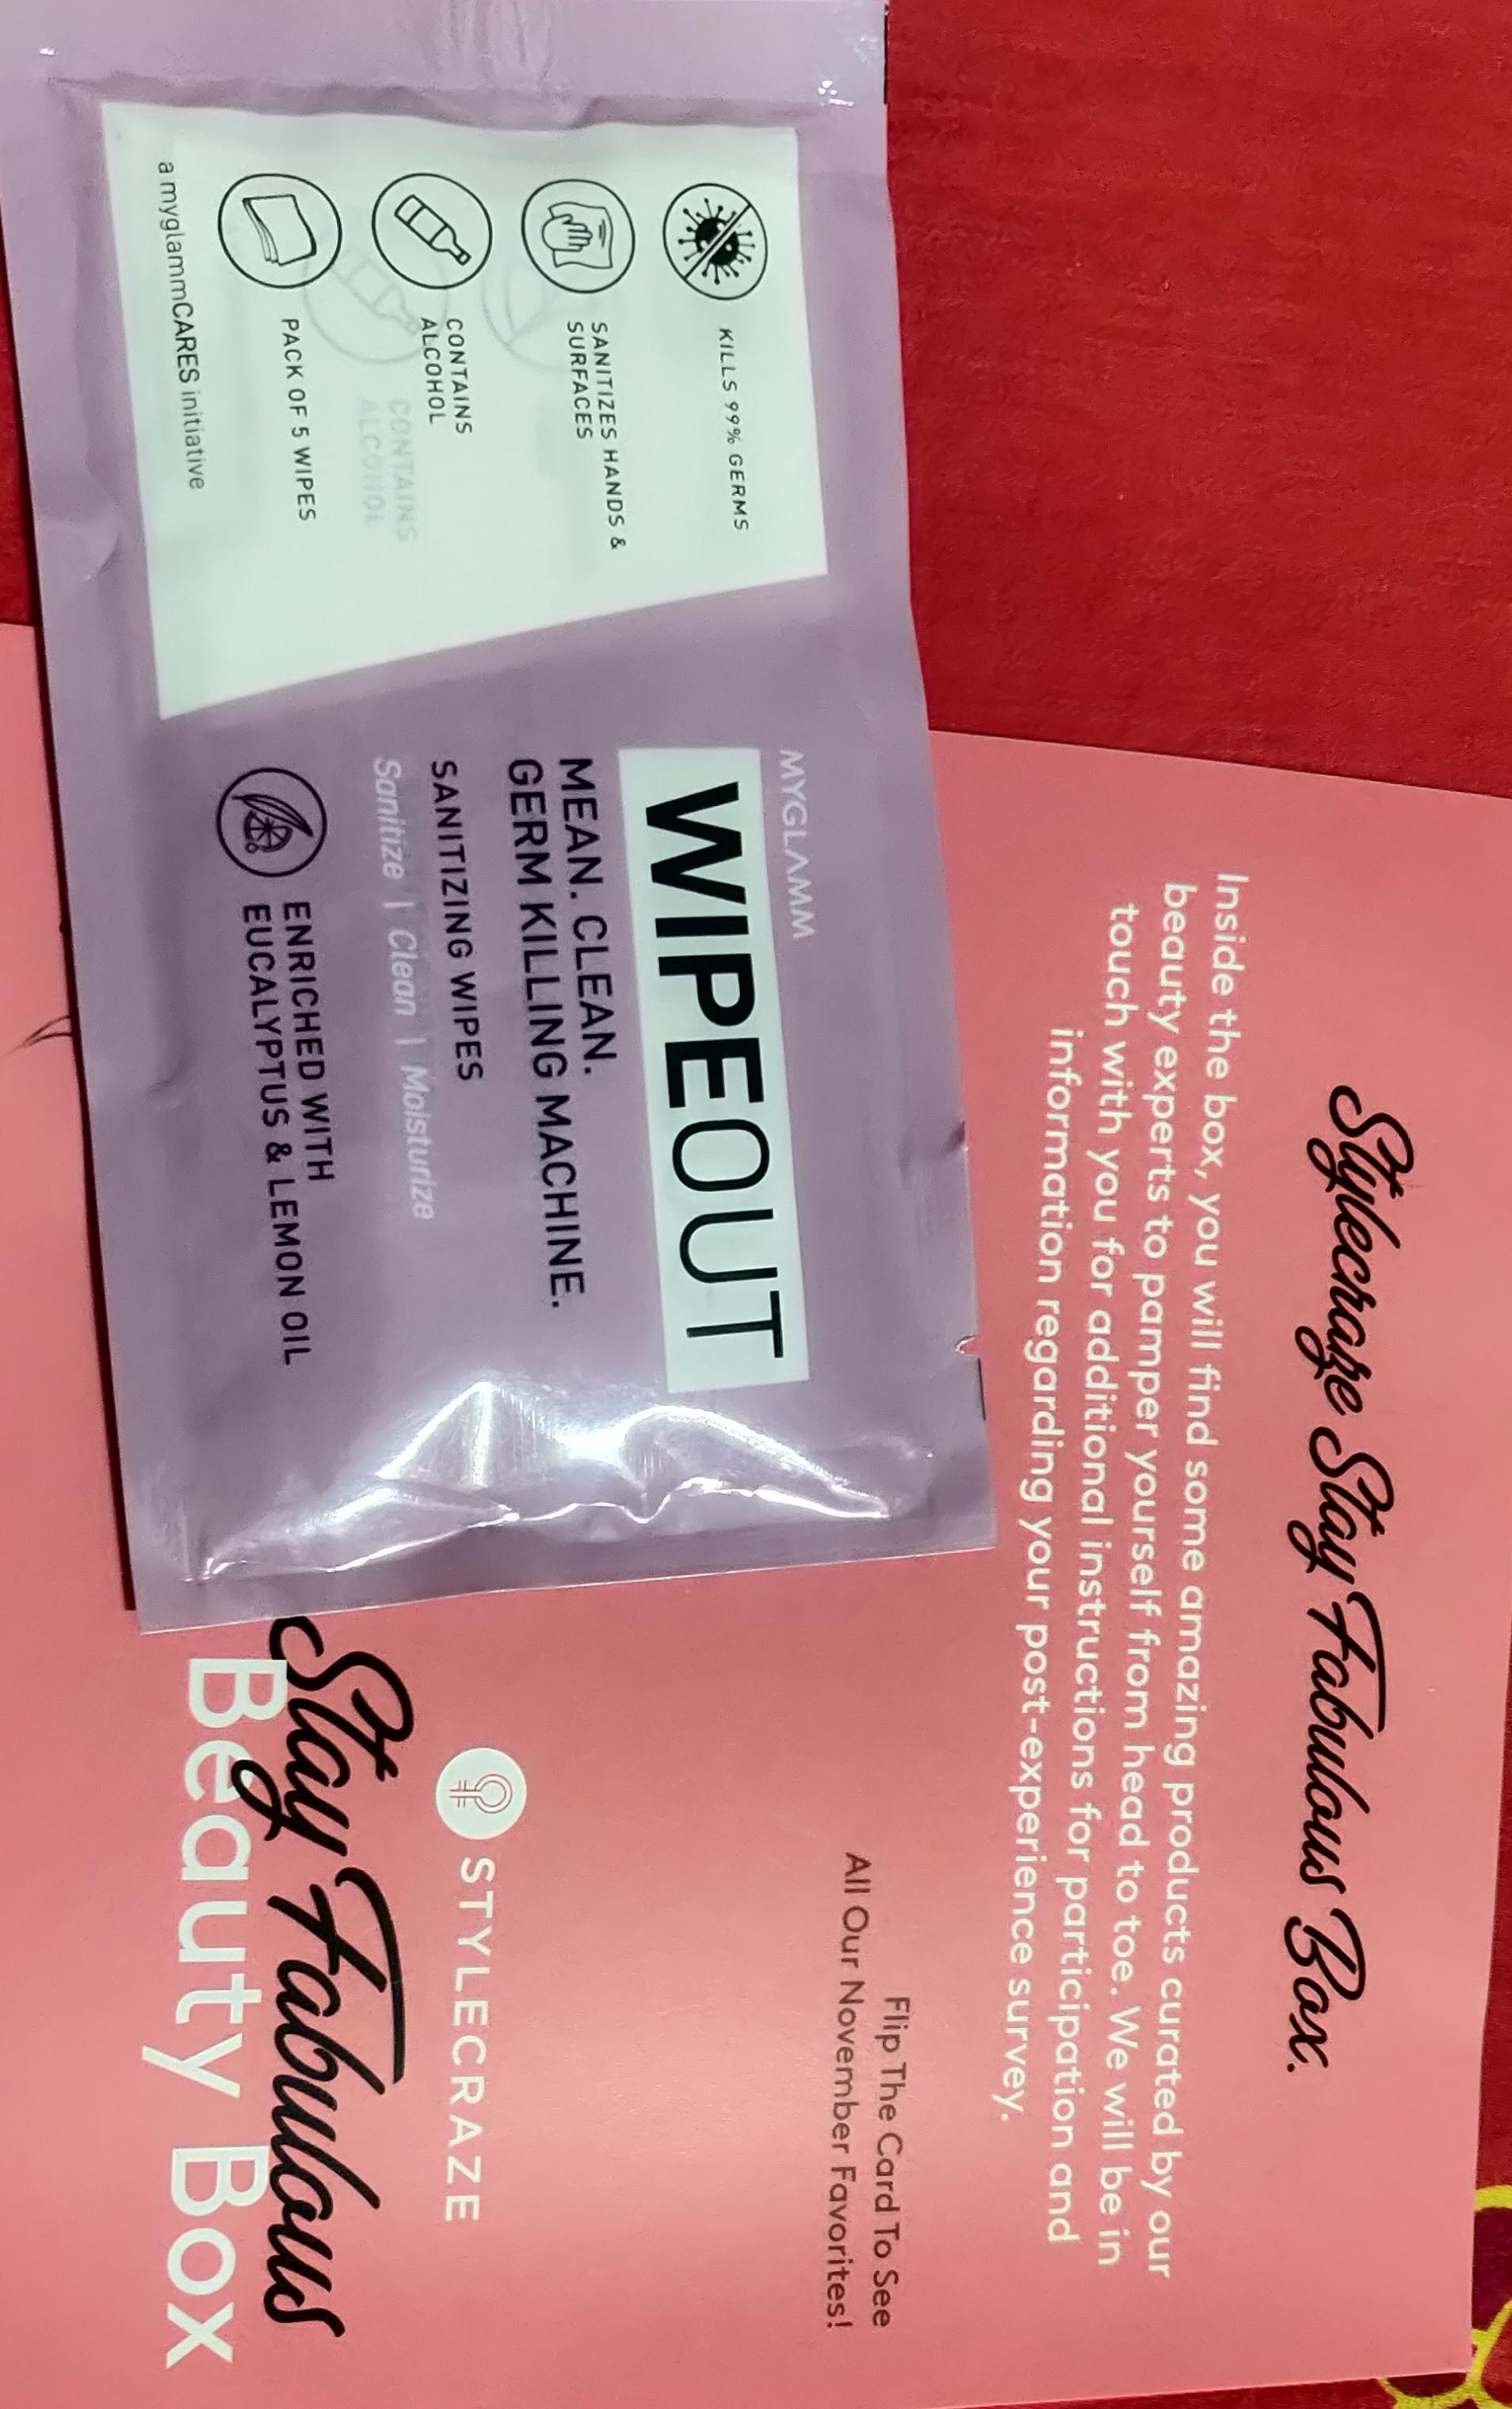 MyGlamm Wipeout Sanitizing Wipes-Wonderful wipes-By chandan_kumar-4